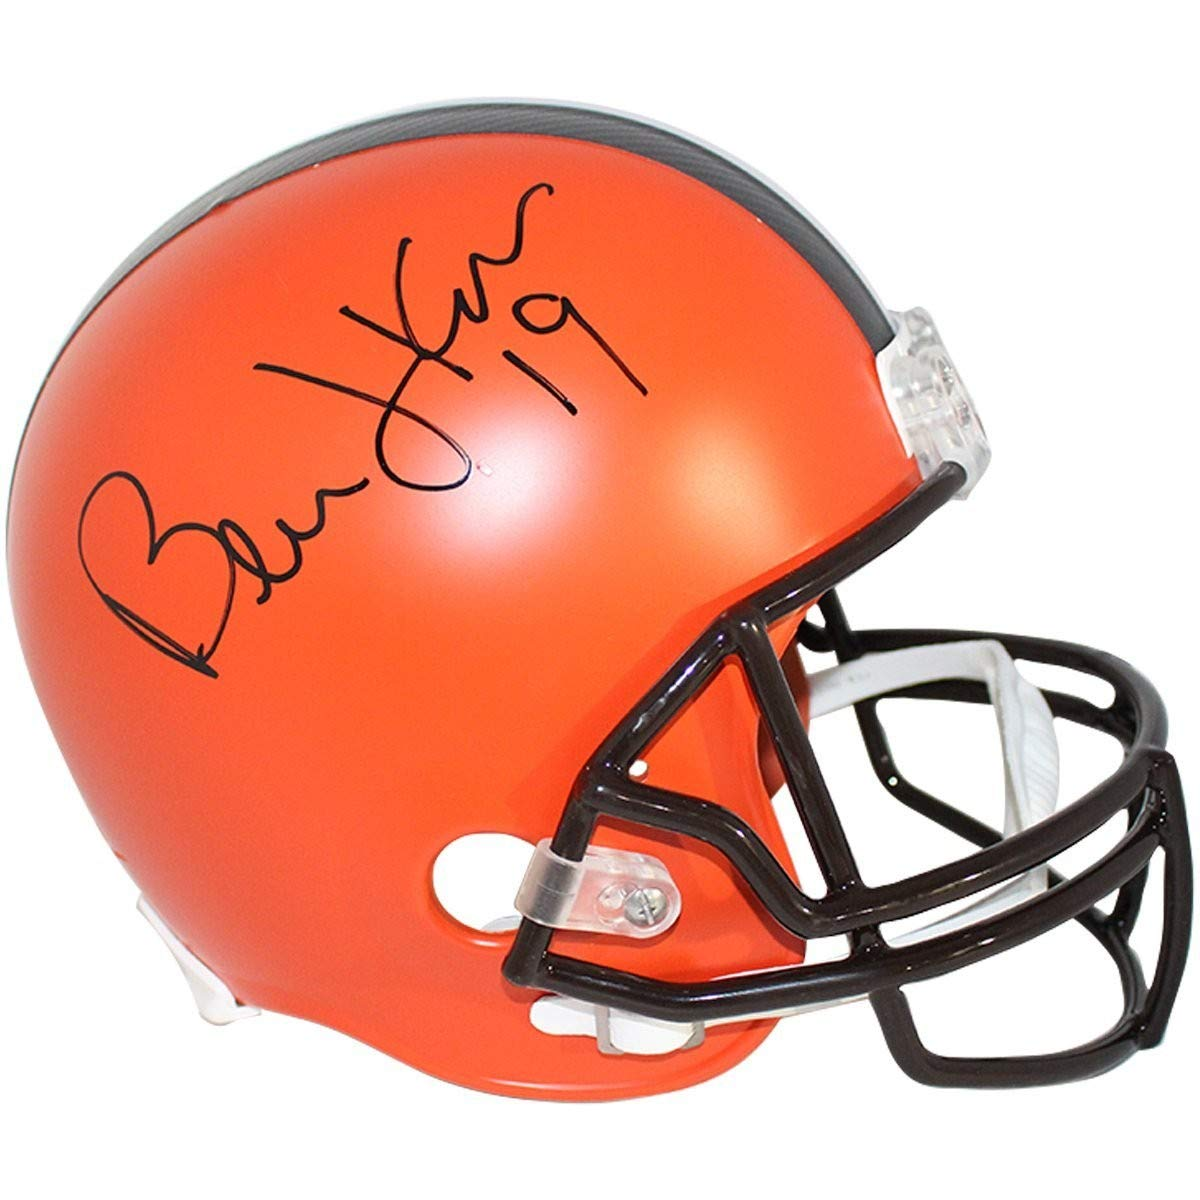 7fcfa1cf Amazon.com: Bernie Kosar Autographed Signed Cleveland Browns Riddell ...